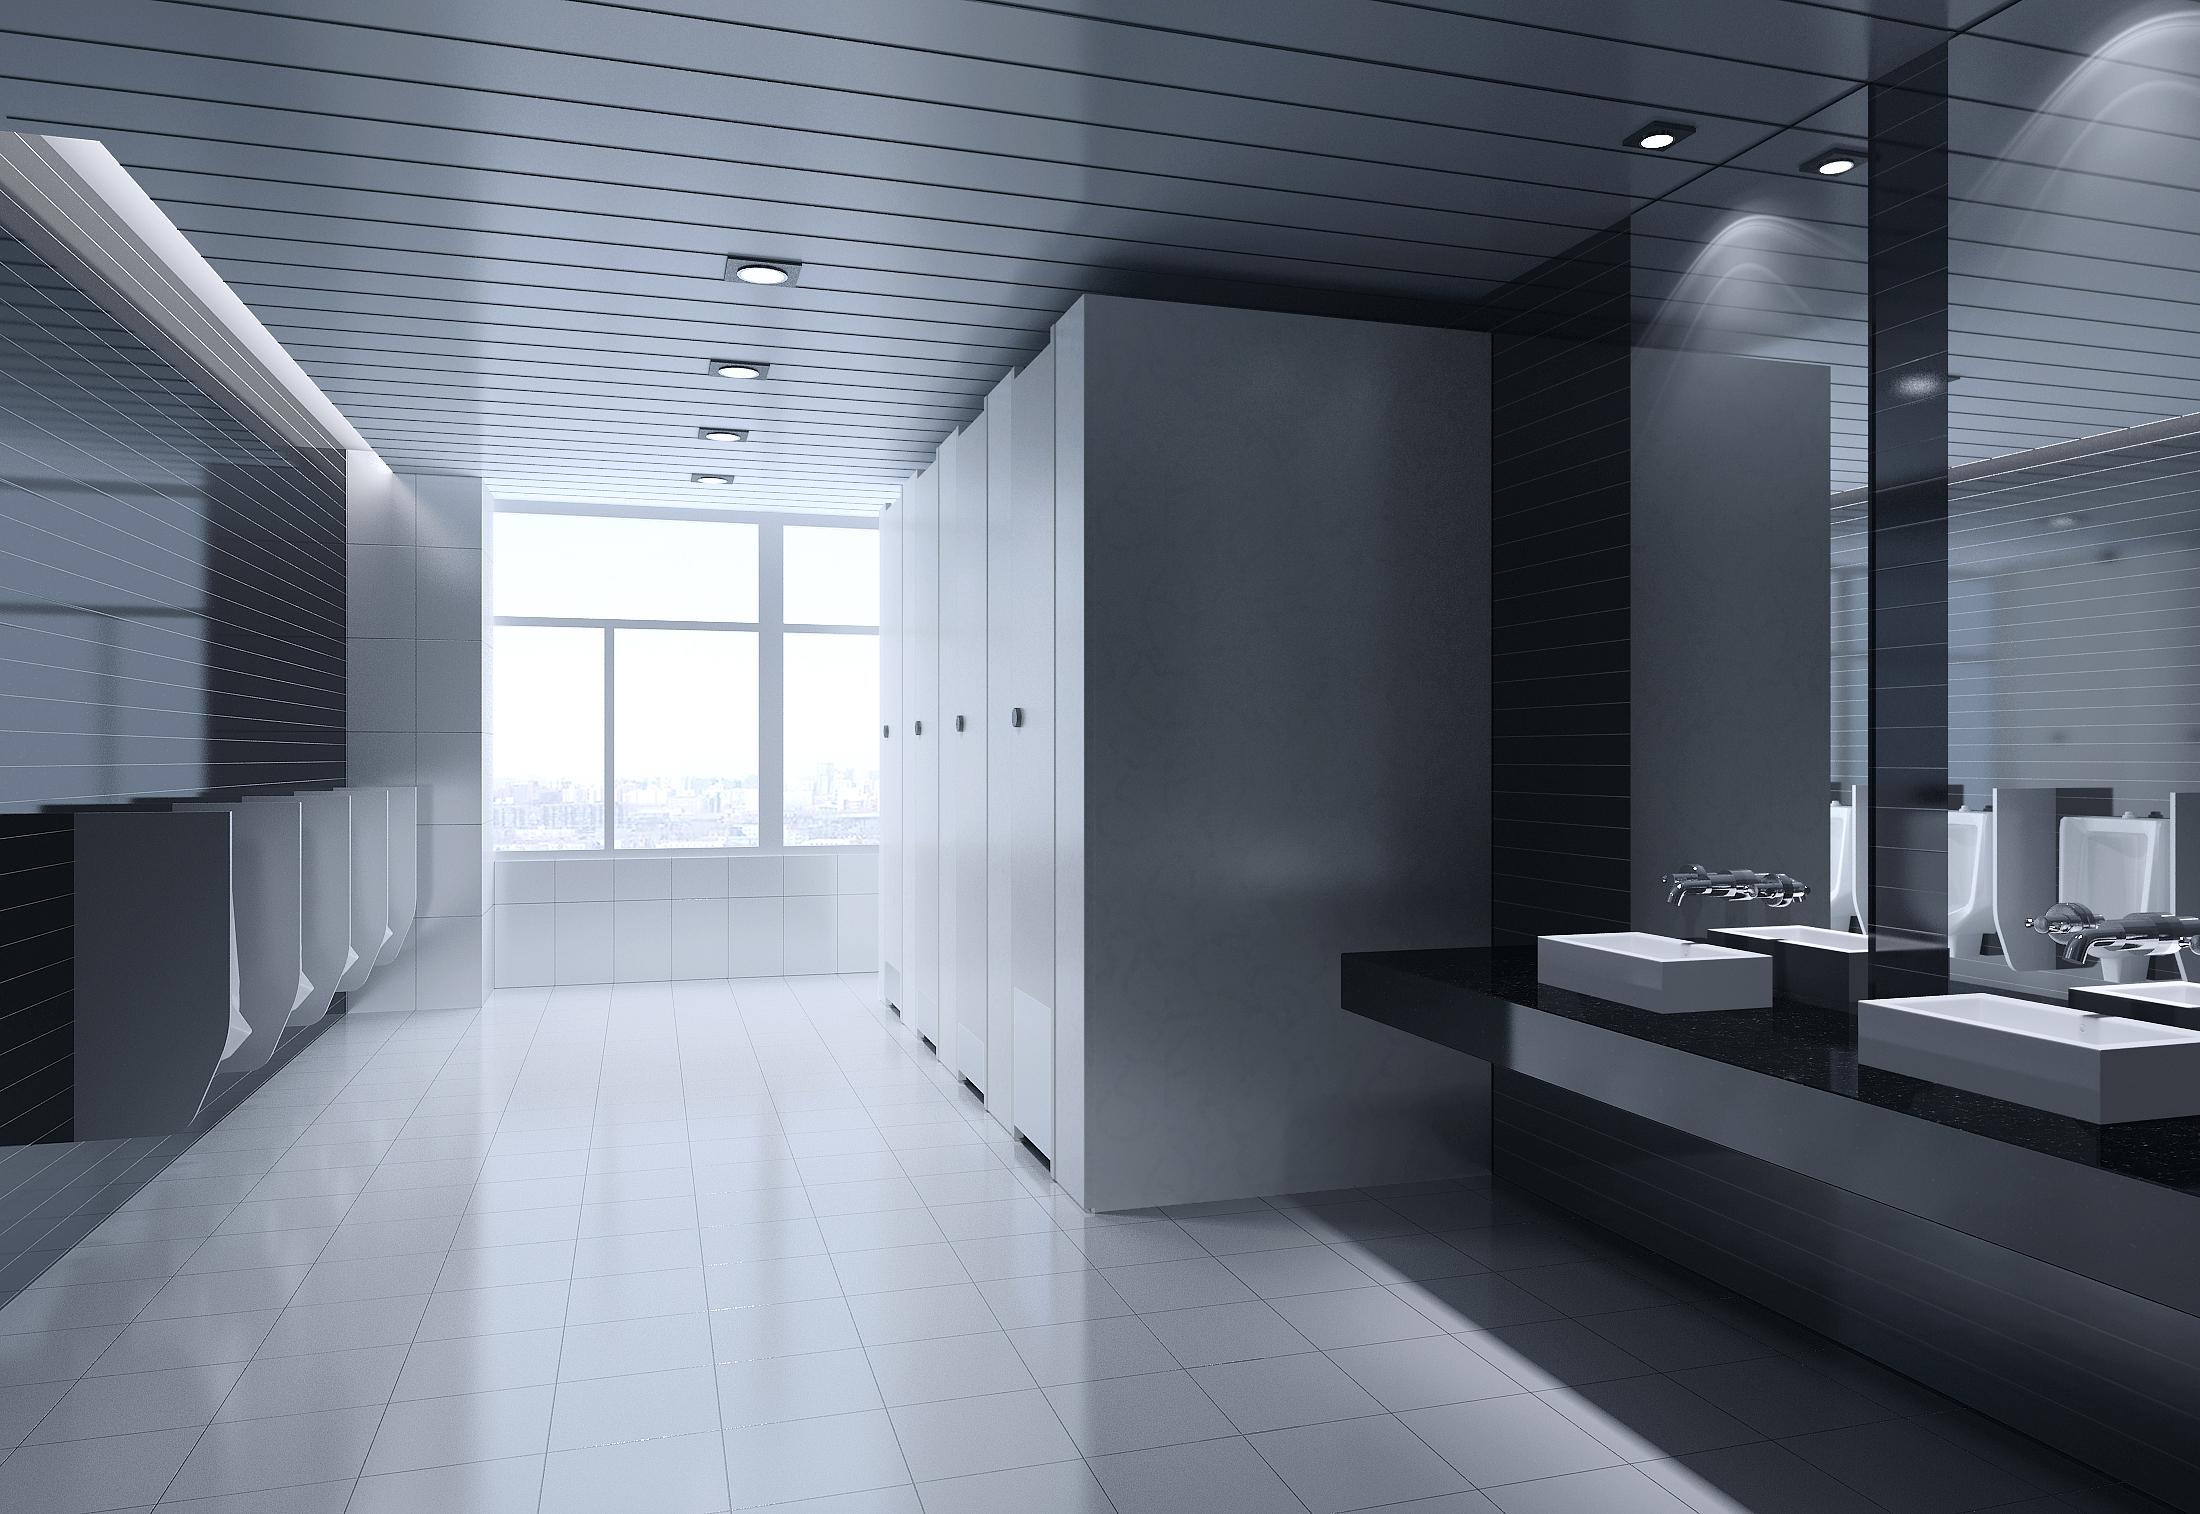 Public Toilet 005 - №2 3D Model - Buy Public Toilet 005 ... on Model Toilet Design  id=25407